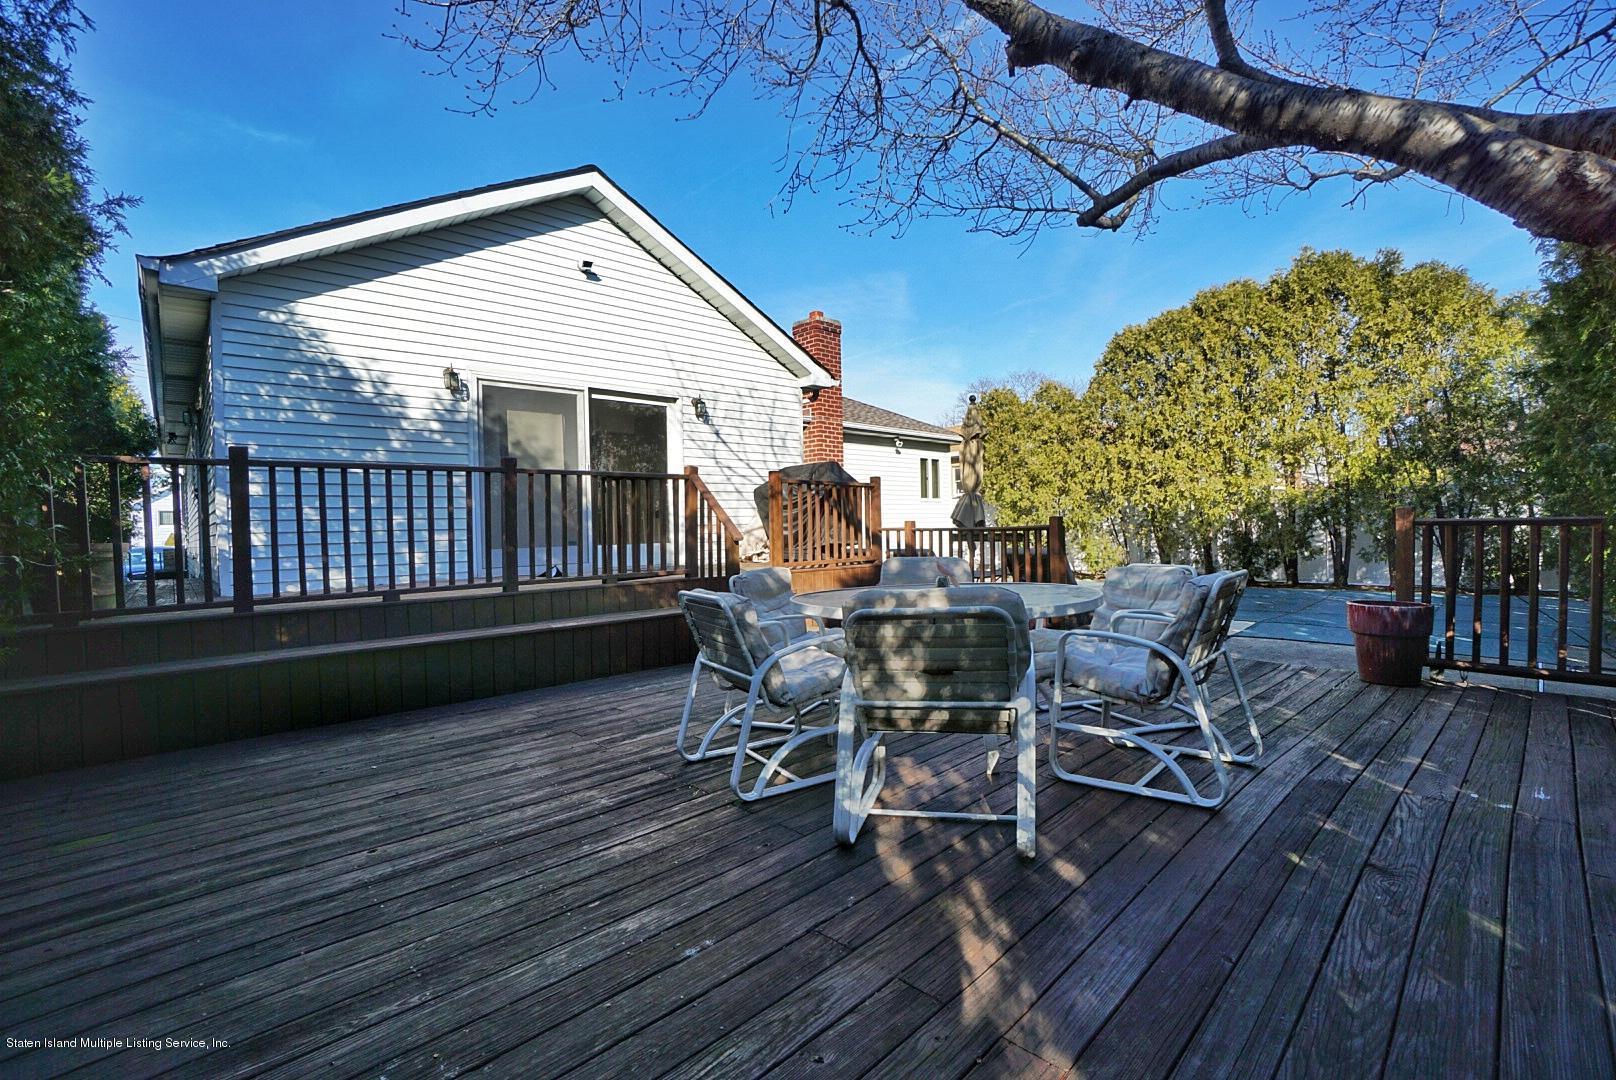 Single Family - Detached 183 Kensington Avenue  Staten Island, NY 10305, MLS-1127107-4